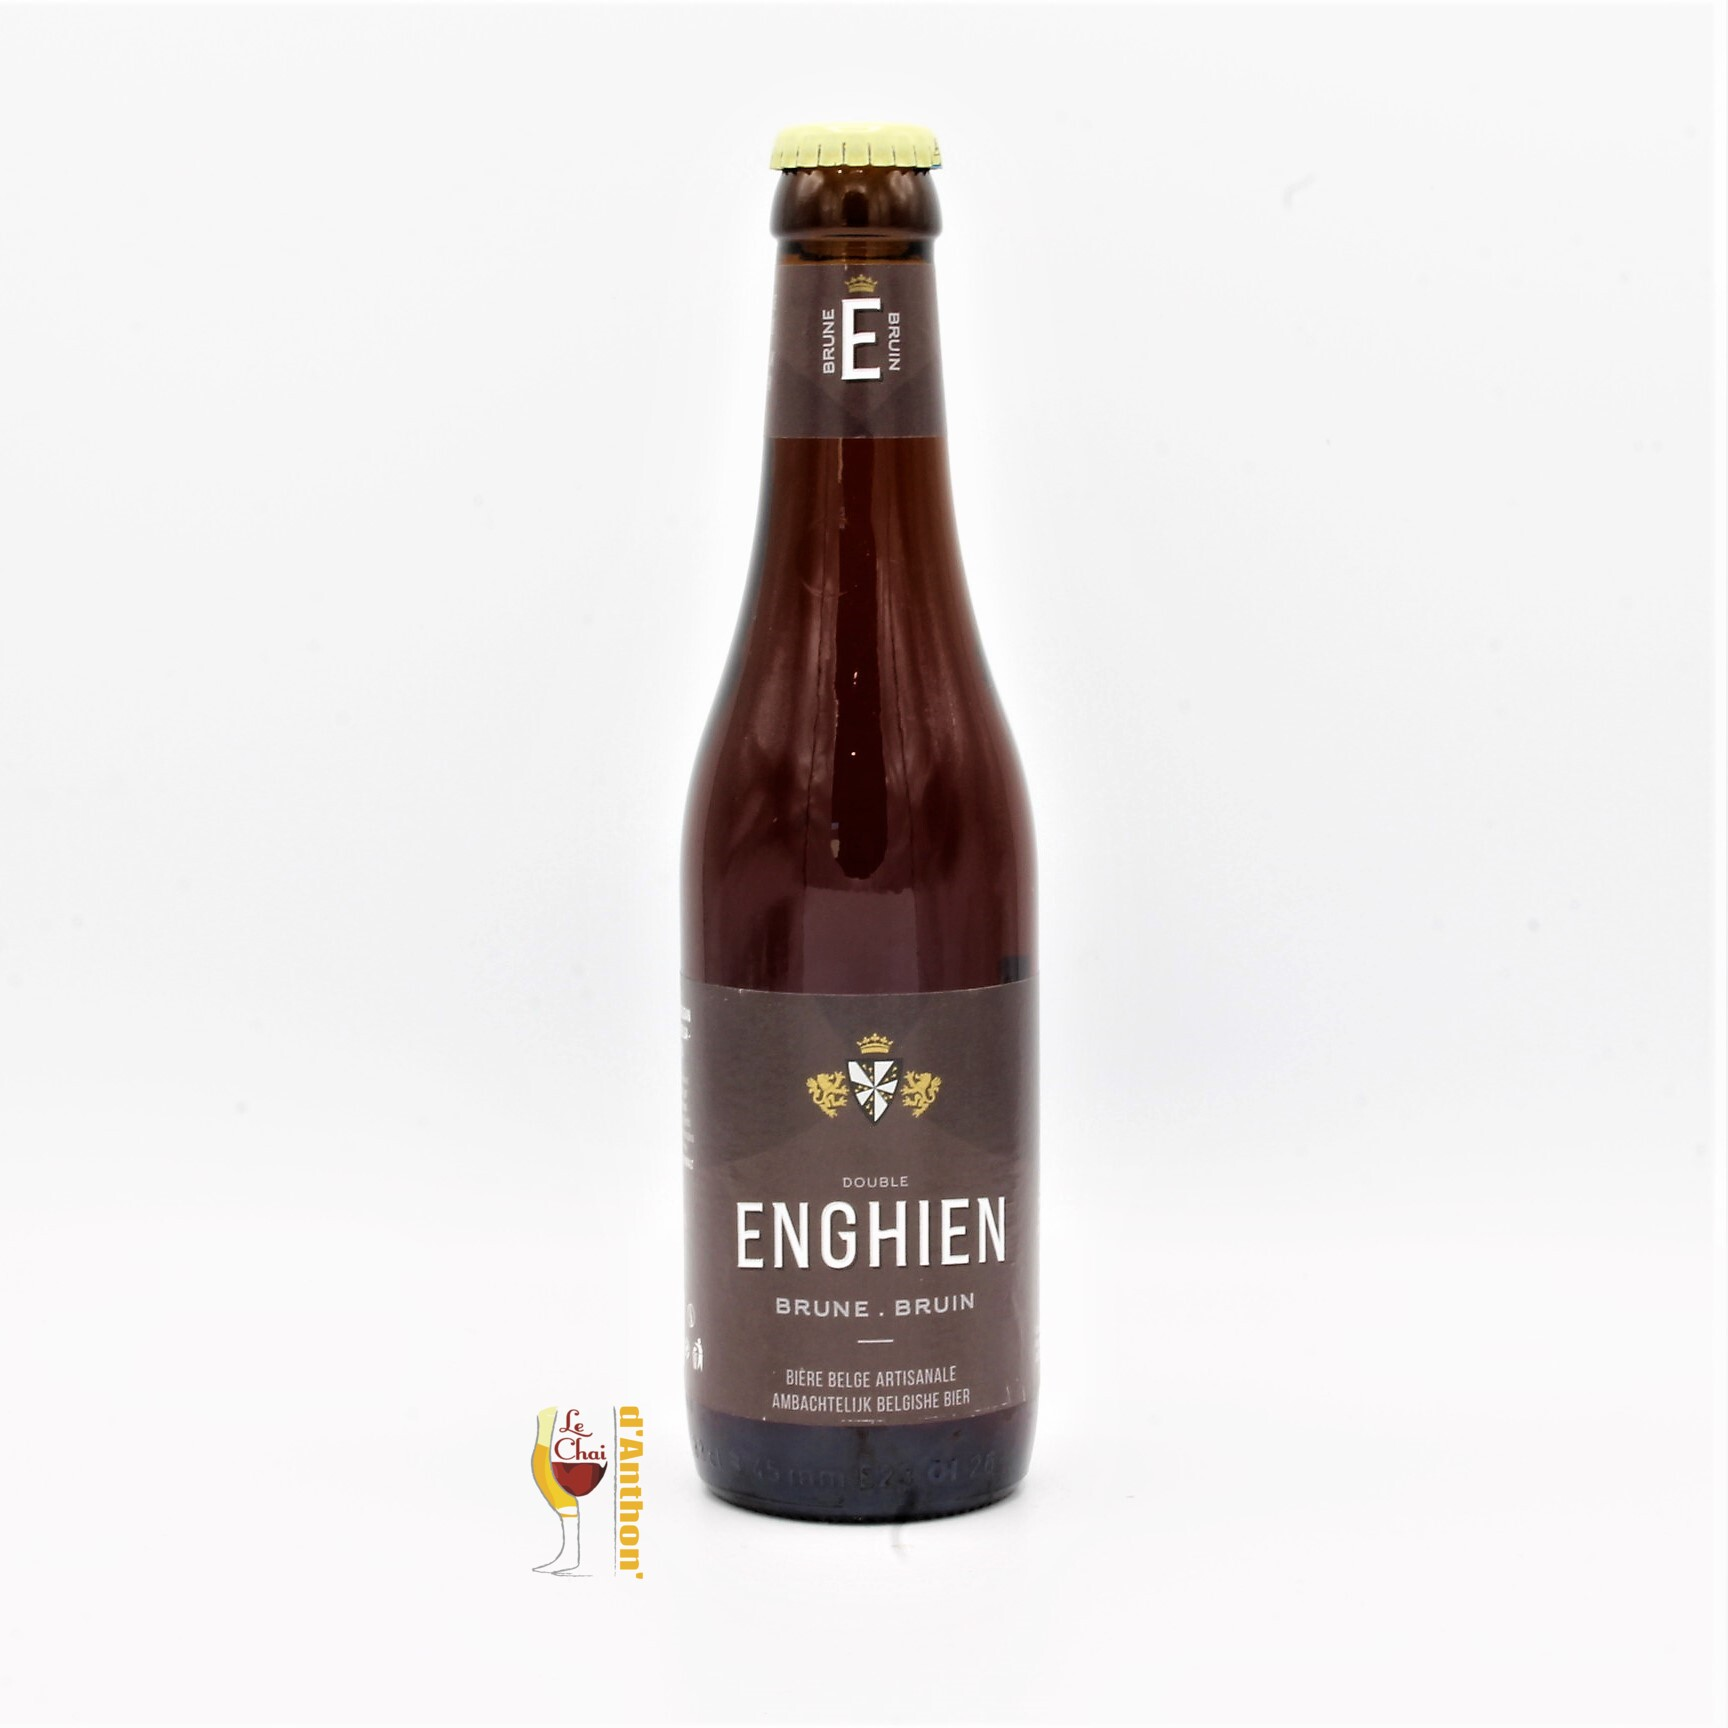 Le Chai D&785.JPG039;Anthon Biere Bouteille Brune Brasserie Silly Enghien Belge 33cl 785